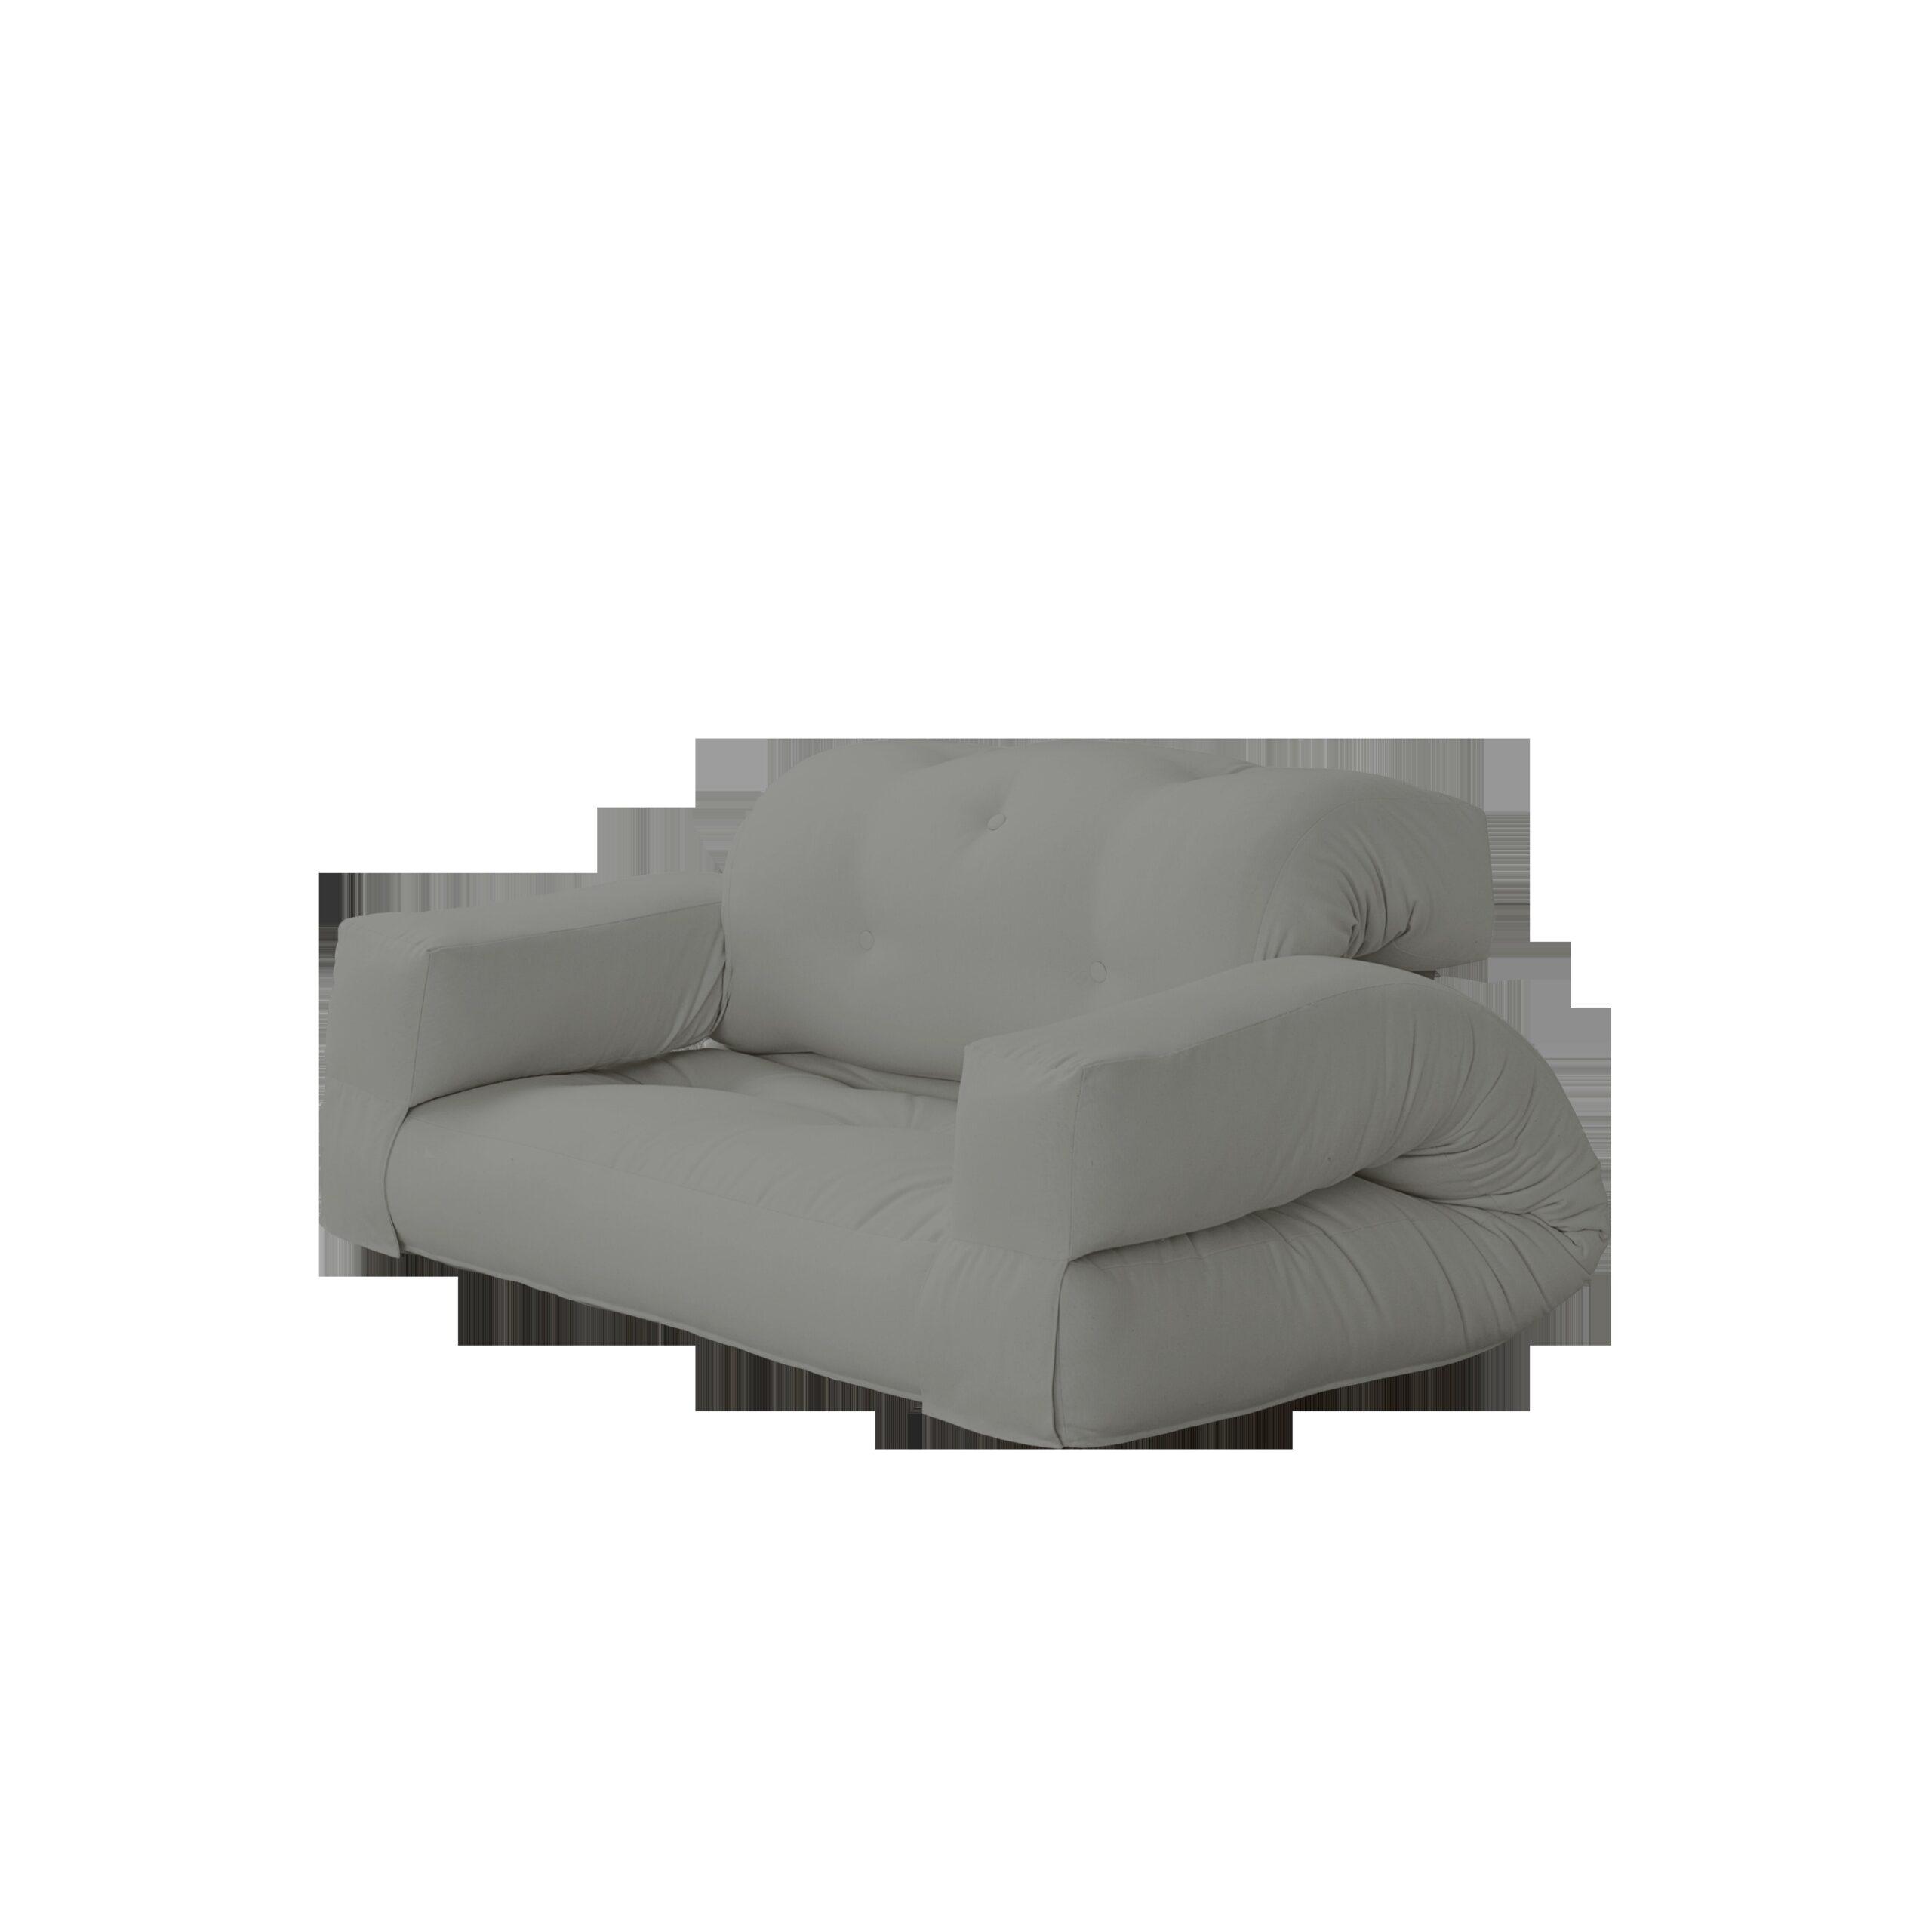 Full Size of Sitzsack Sofa Karup Hippo Wayfairde 3 Sitzer Innovation Berlin Mit Relaxfunktion Home Affaire Schillig Landhaus Schlafsofa Liegefläche 180x200 Big Sofa Sitzsack Sofa